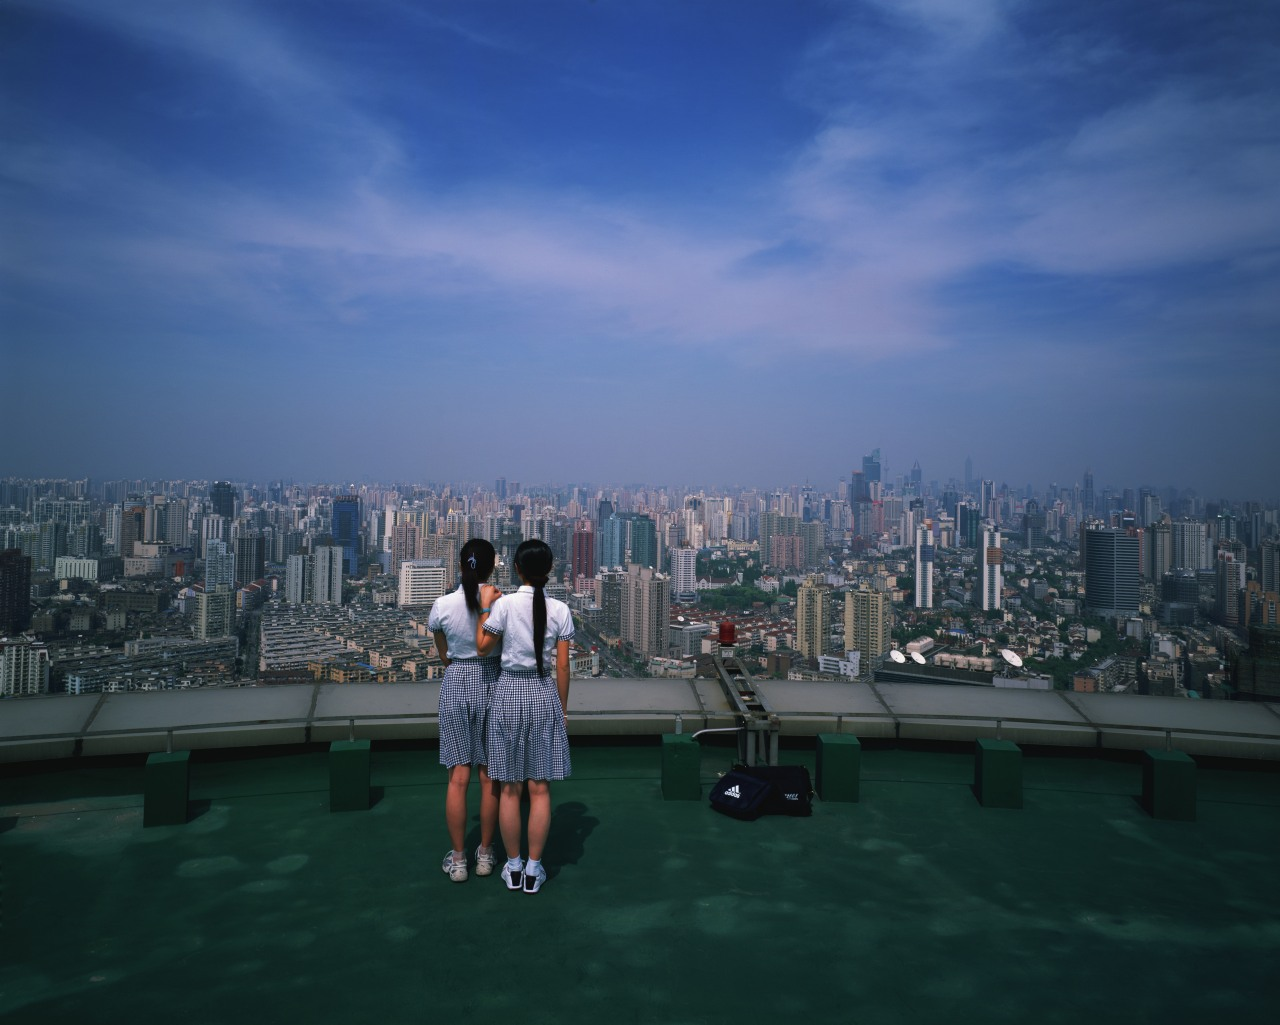 foto 3 Weng Fen